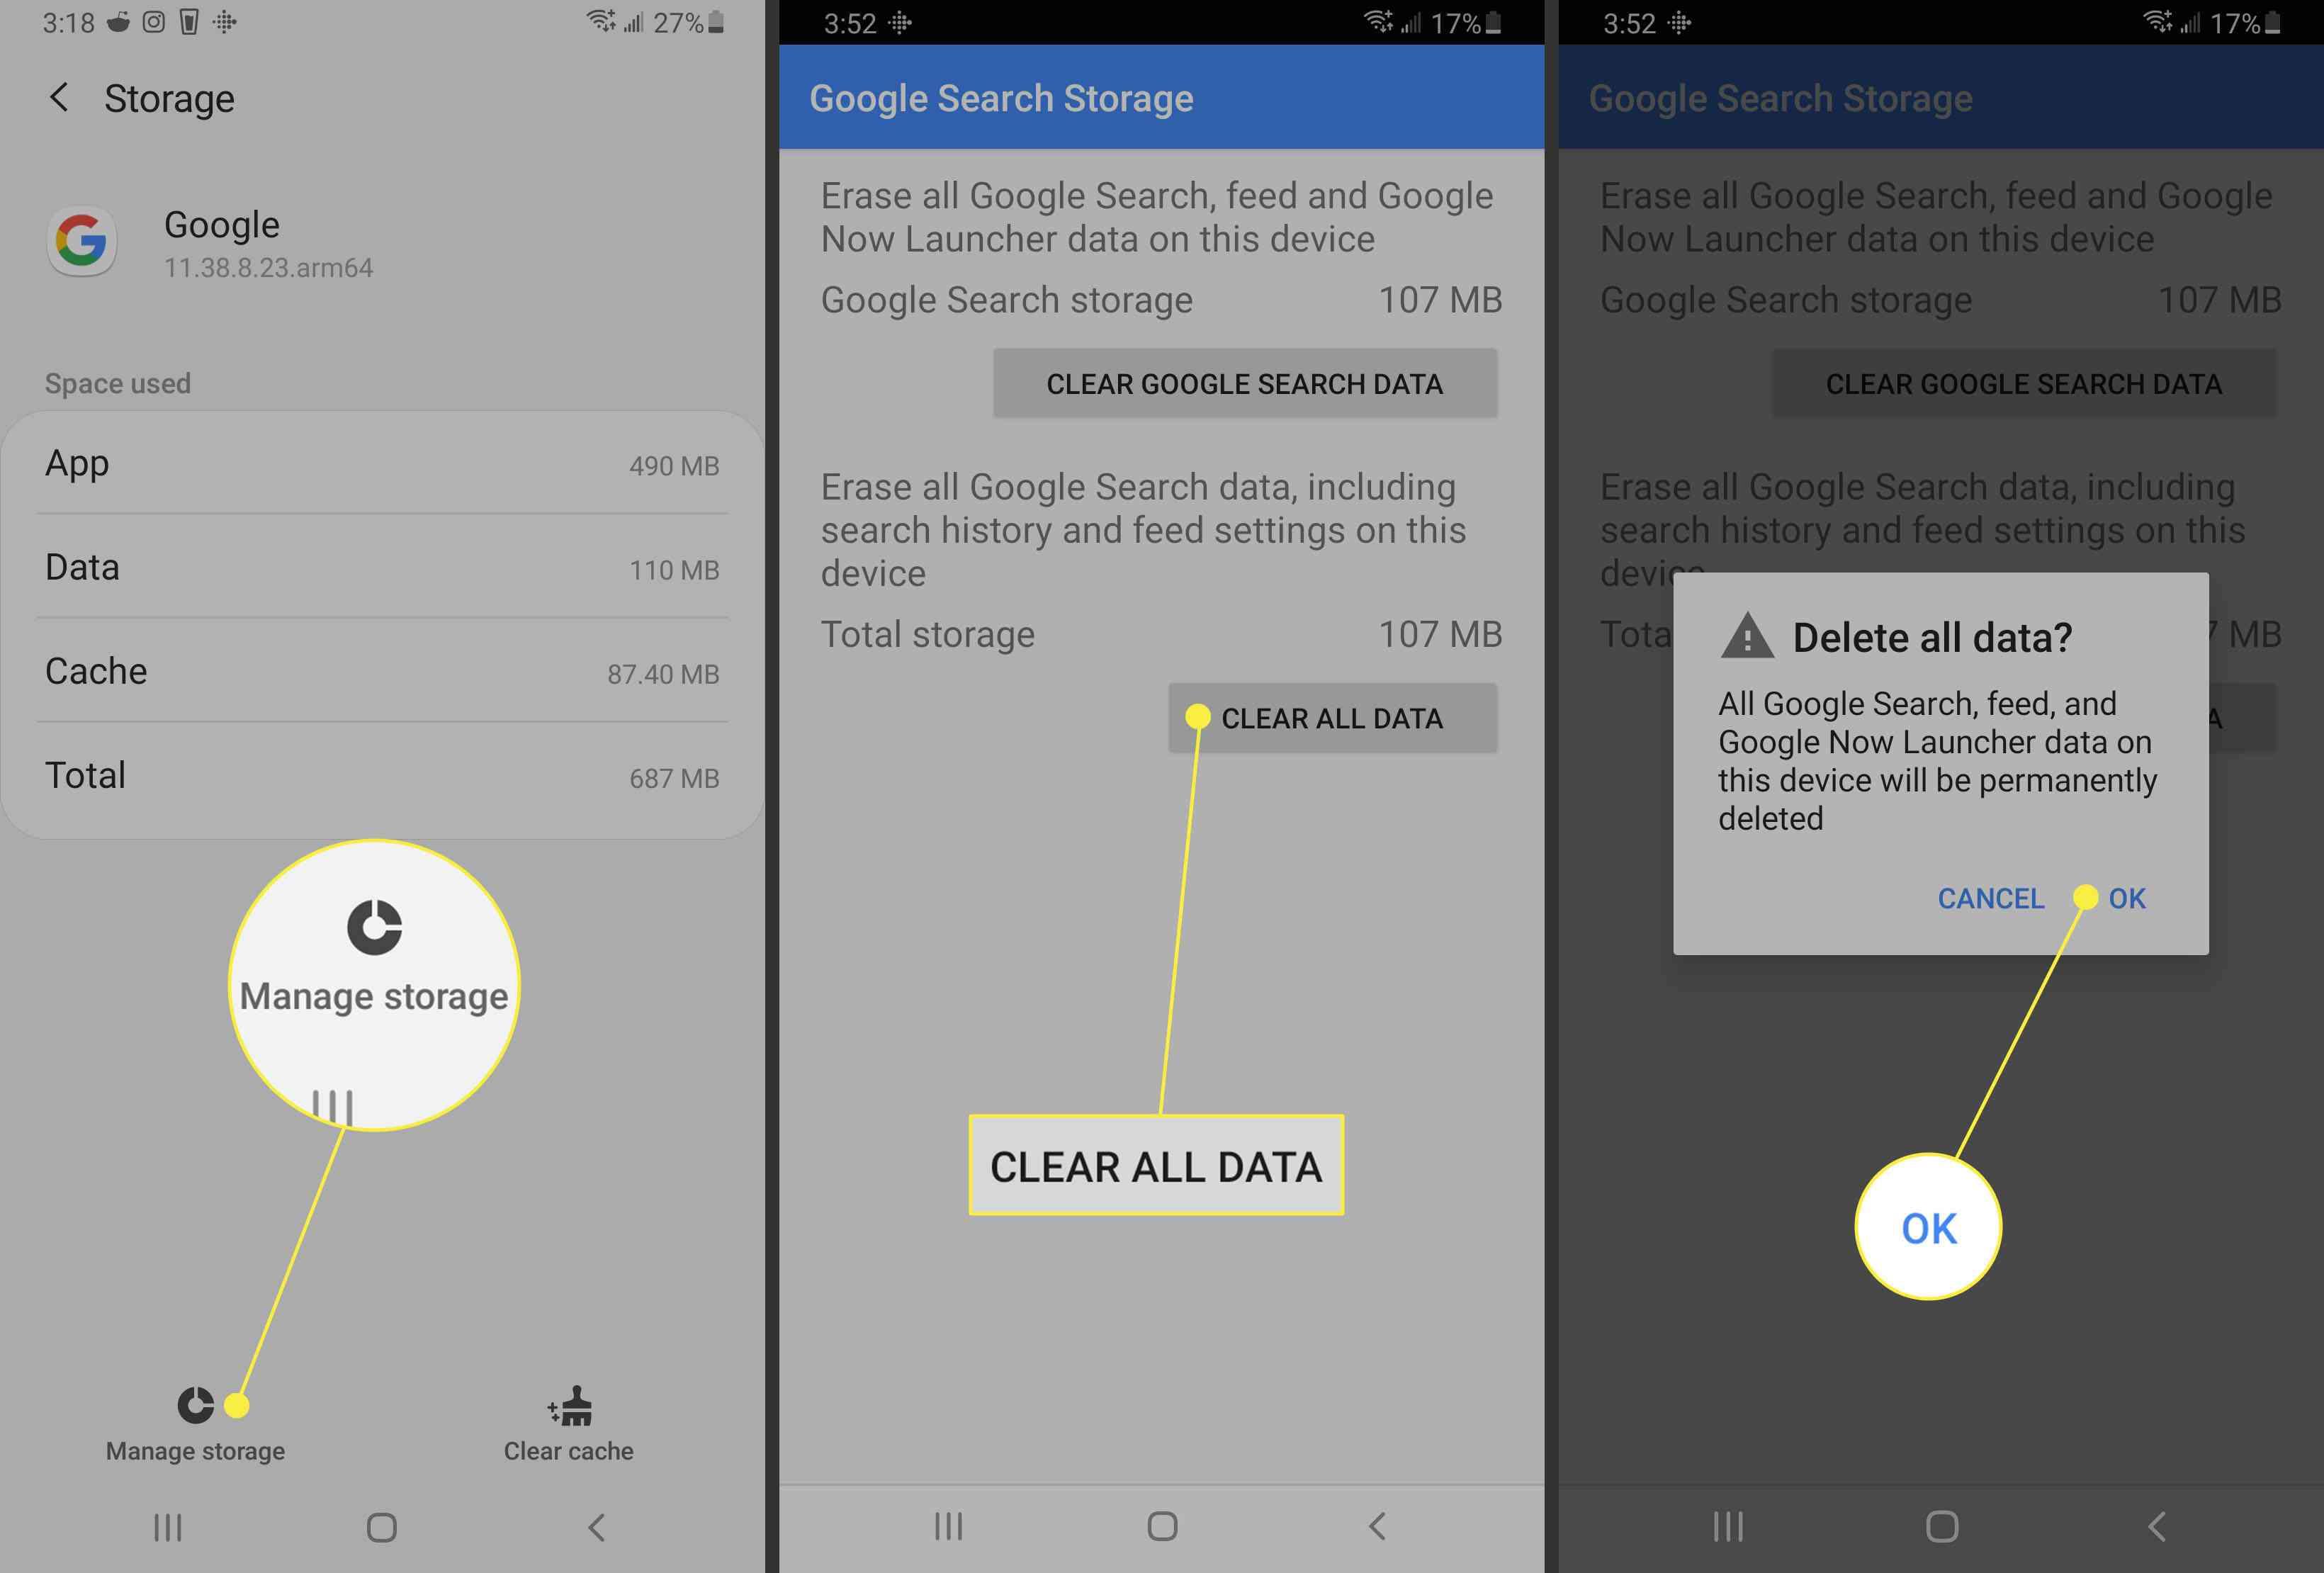 Google app delete all data confirmation.